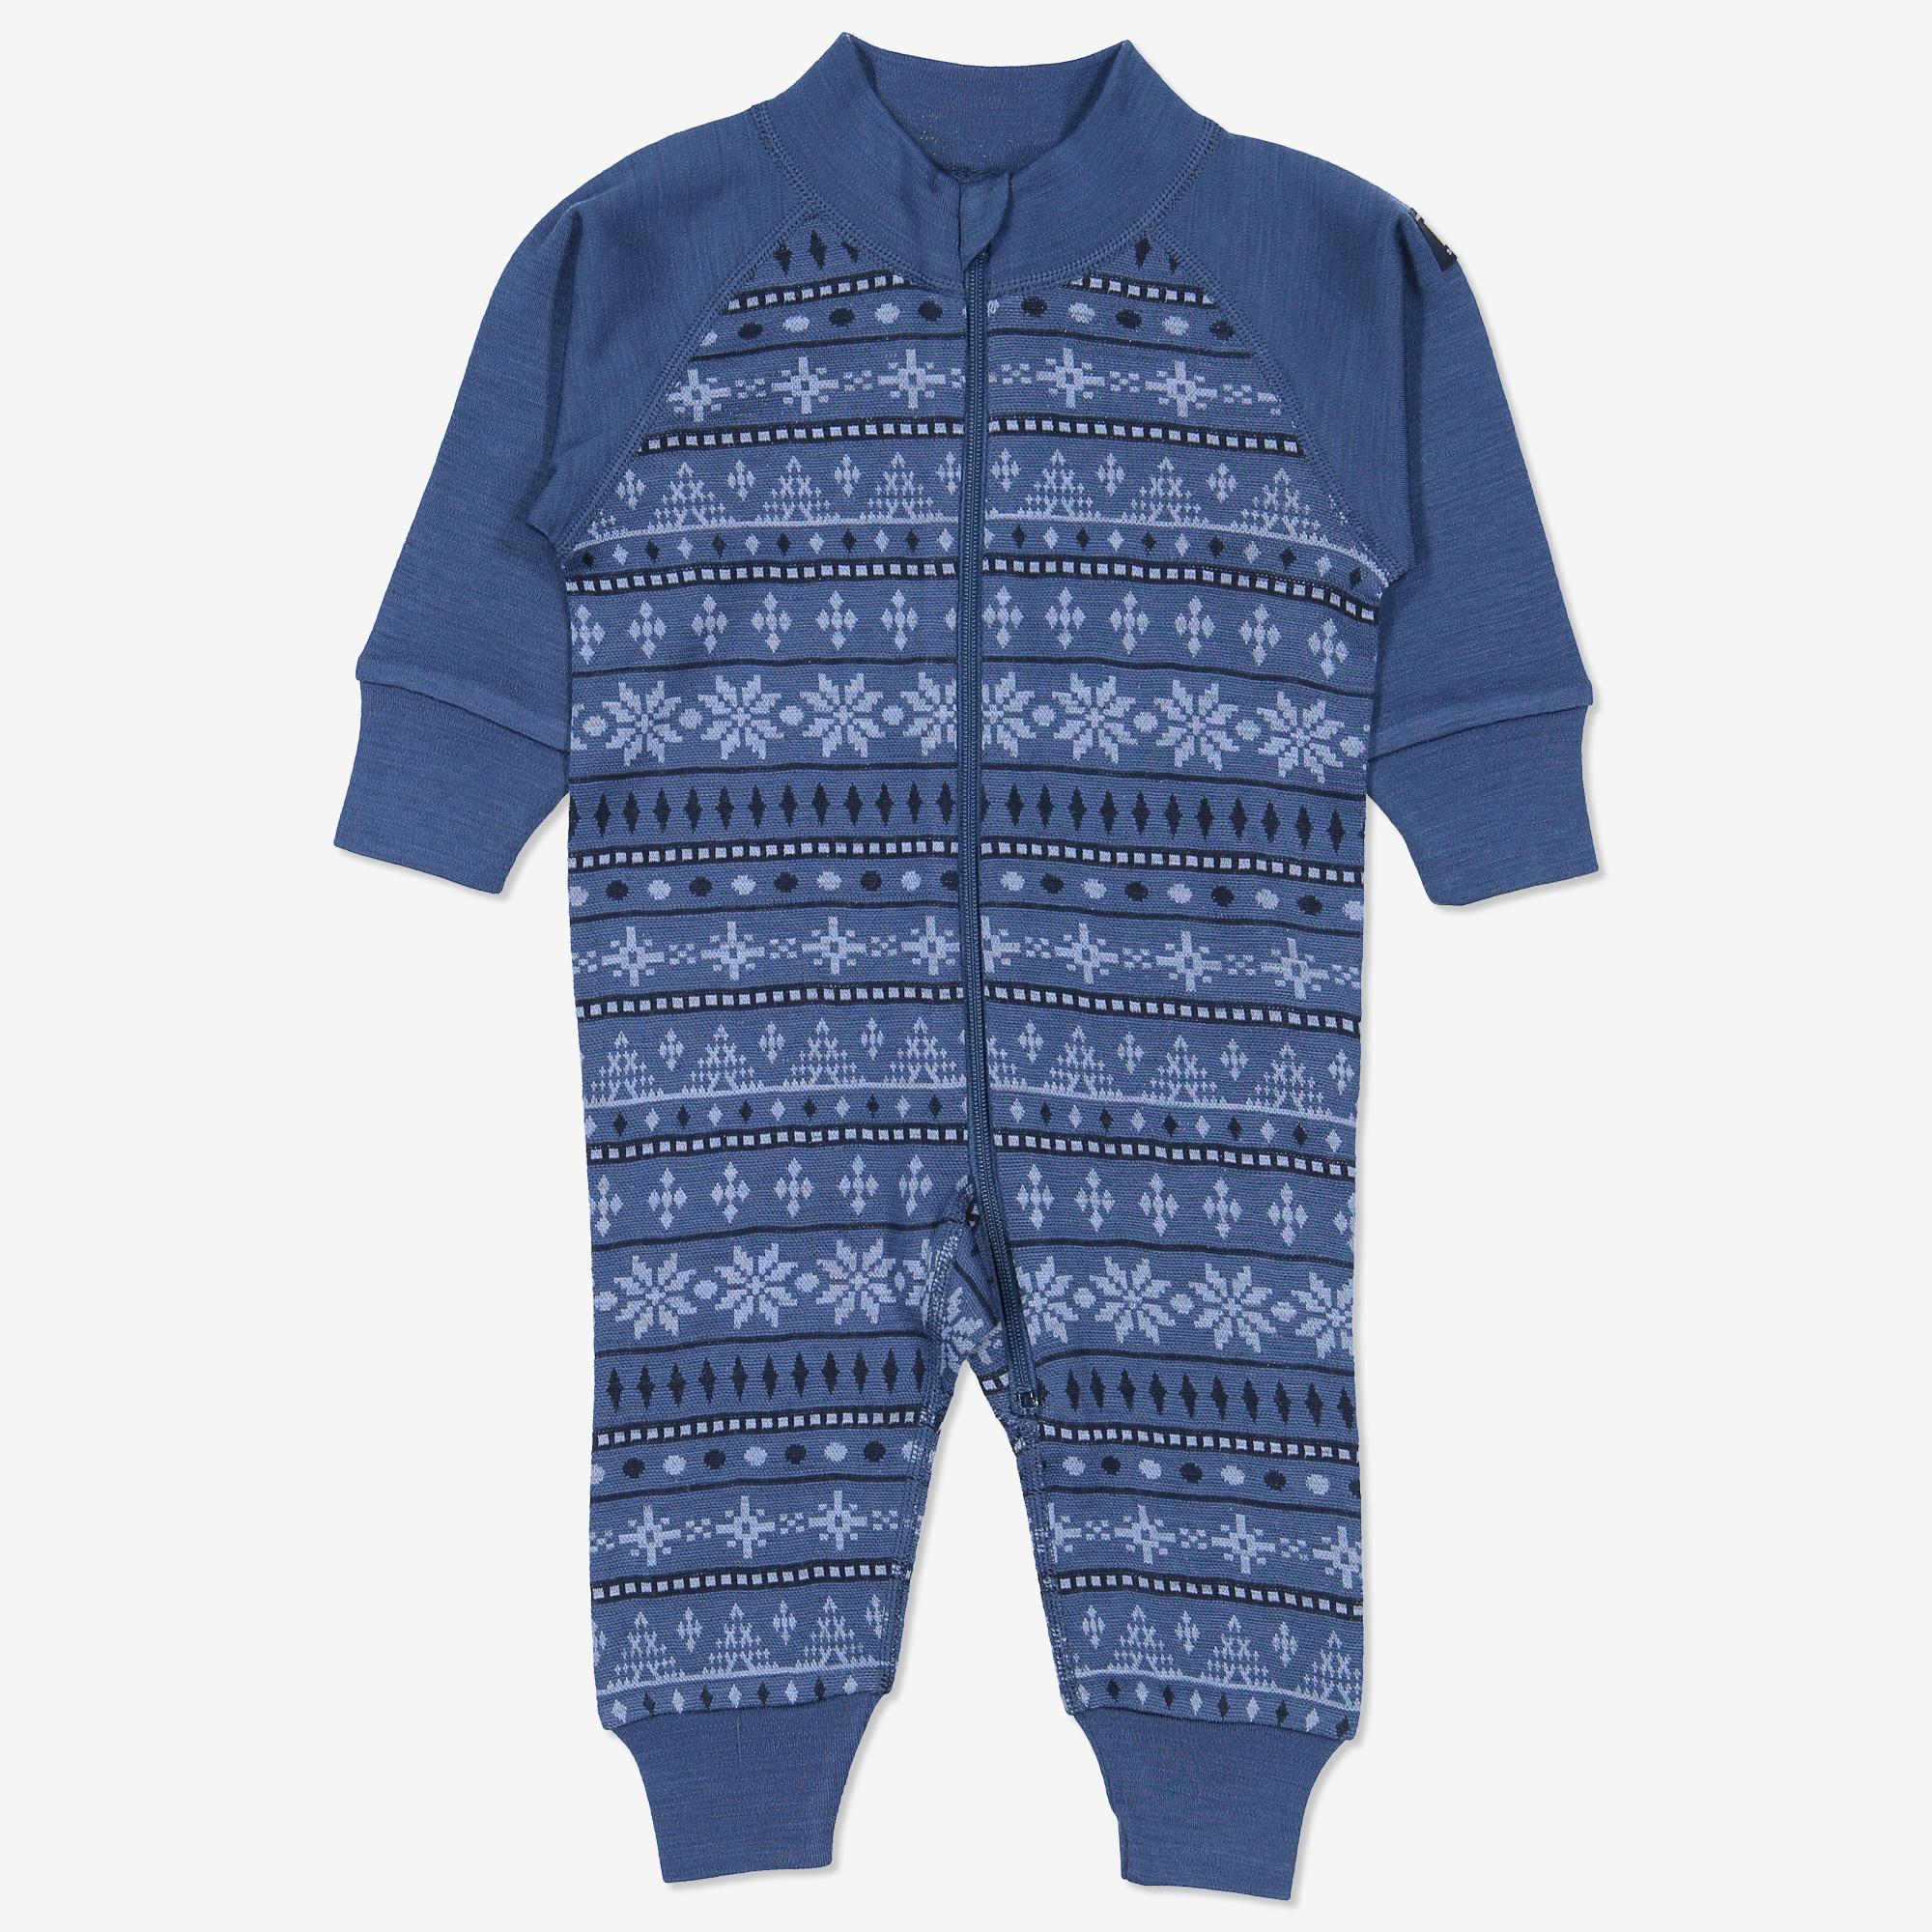 b2716338 Dress ull jaquardmønstret nyfødt blå